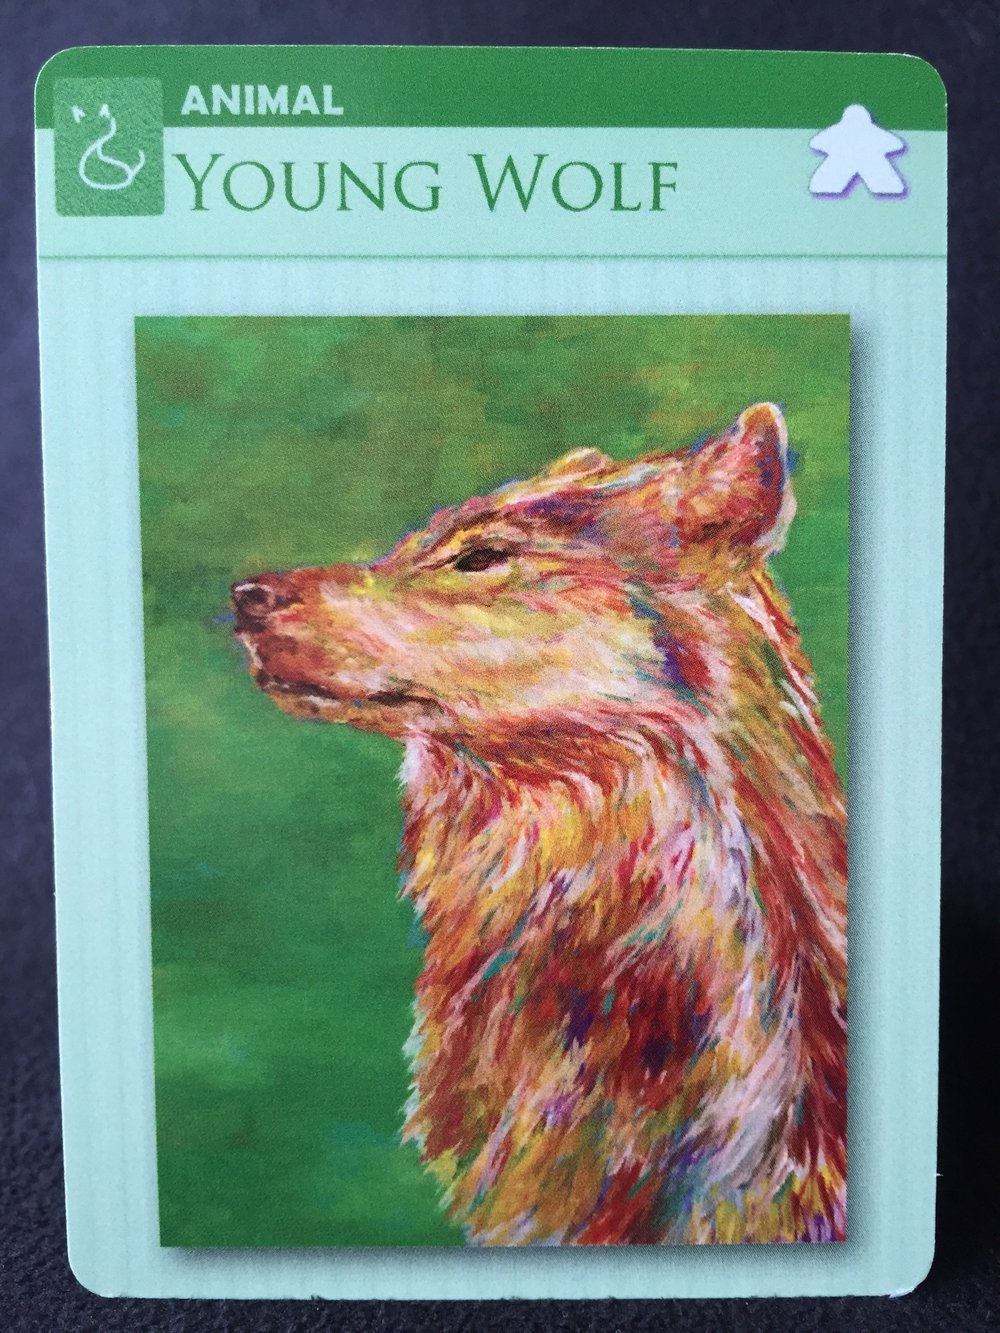 animal young wolf.jpeg